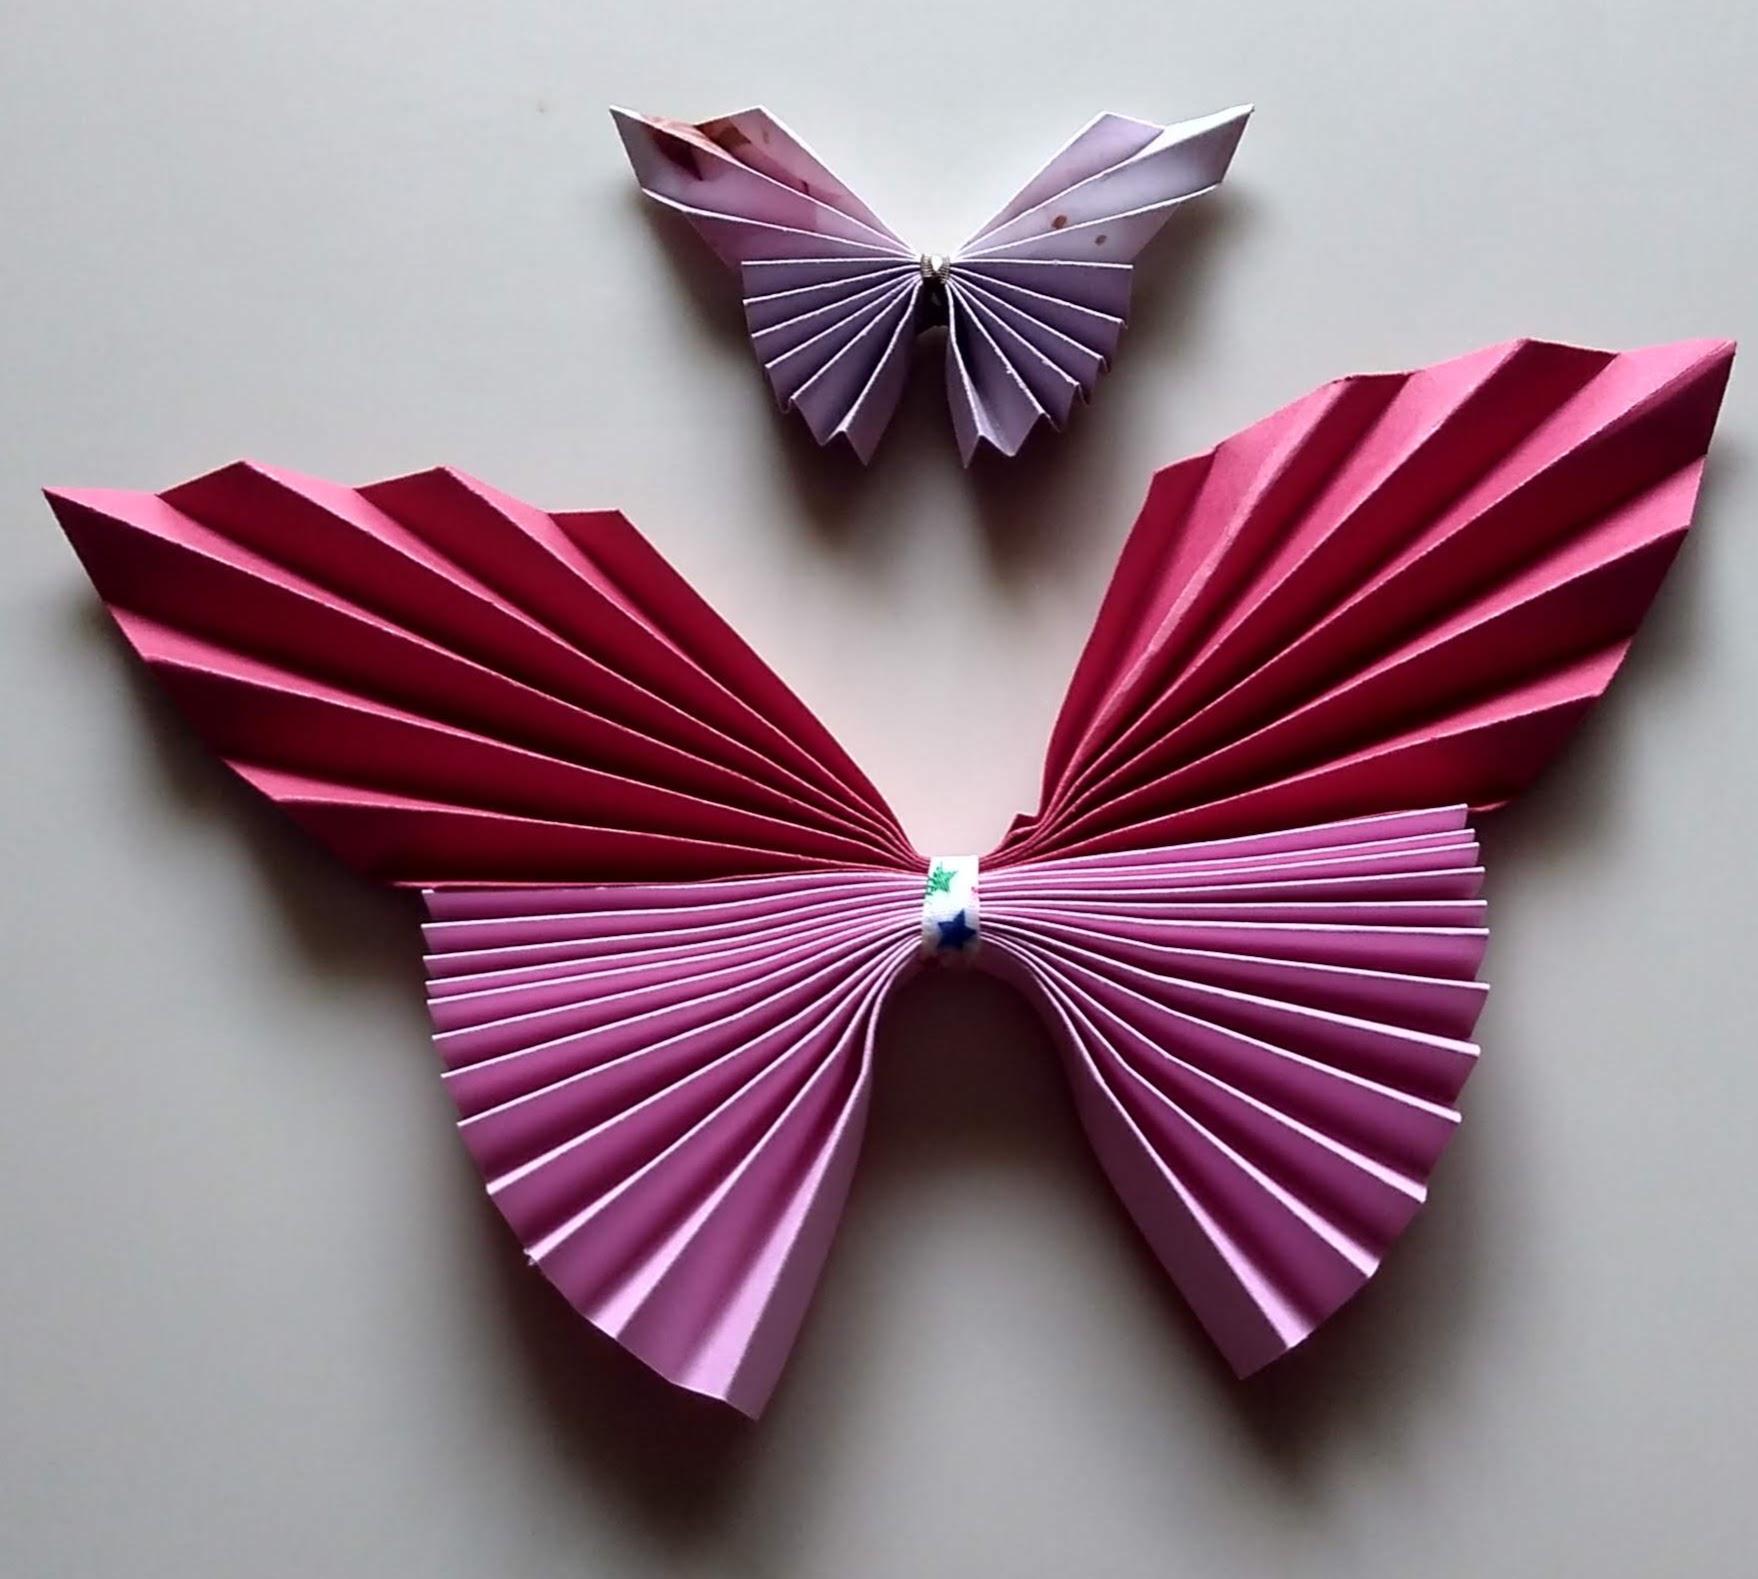 Accordion Fold Butterflies to Make